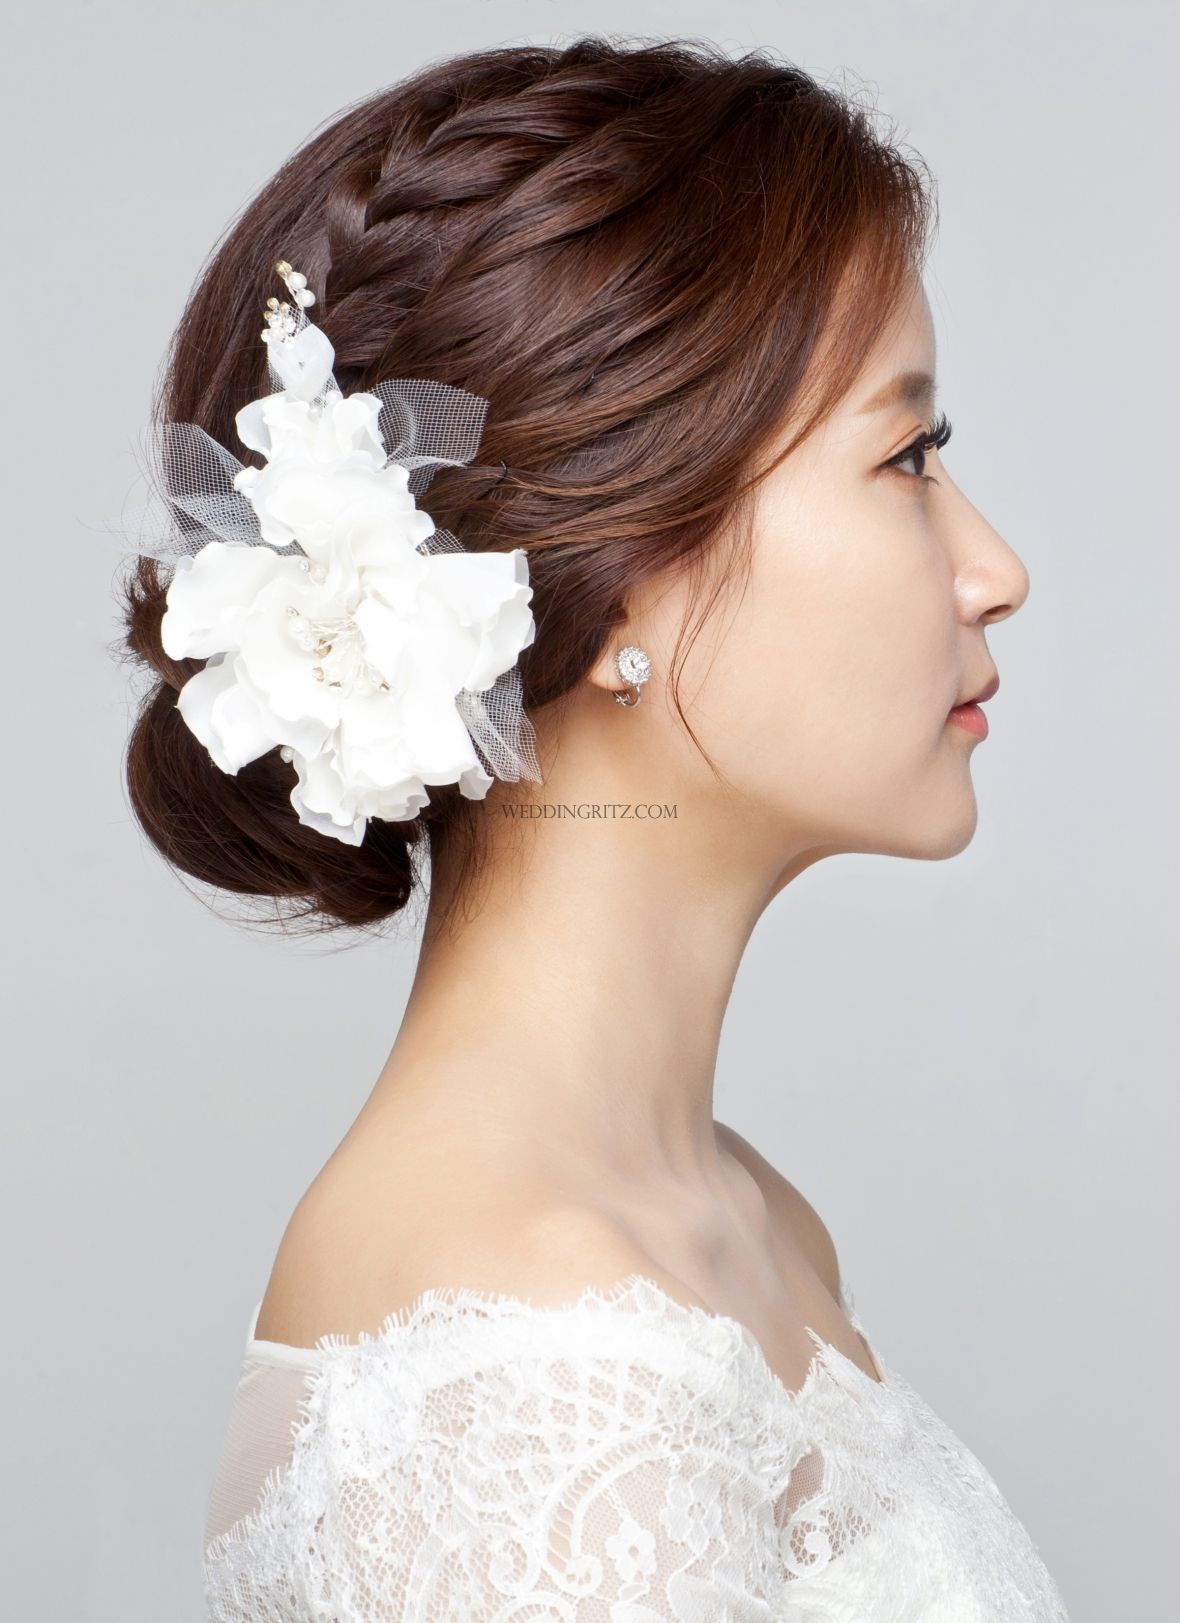 jay salon in korea hair & makeup